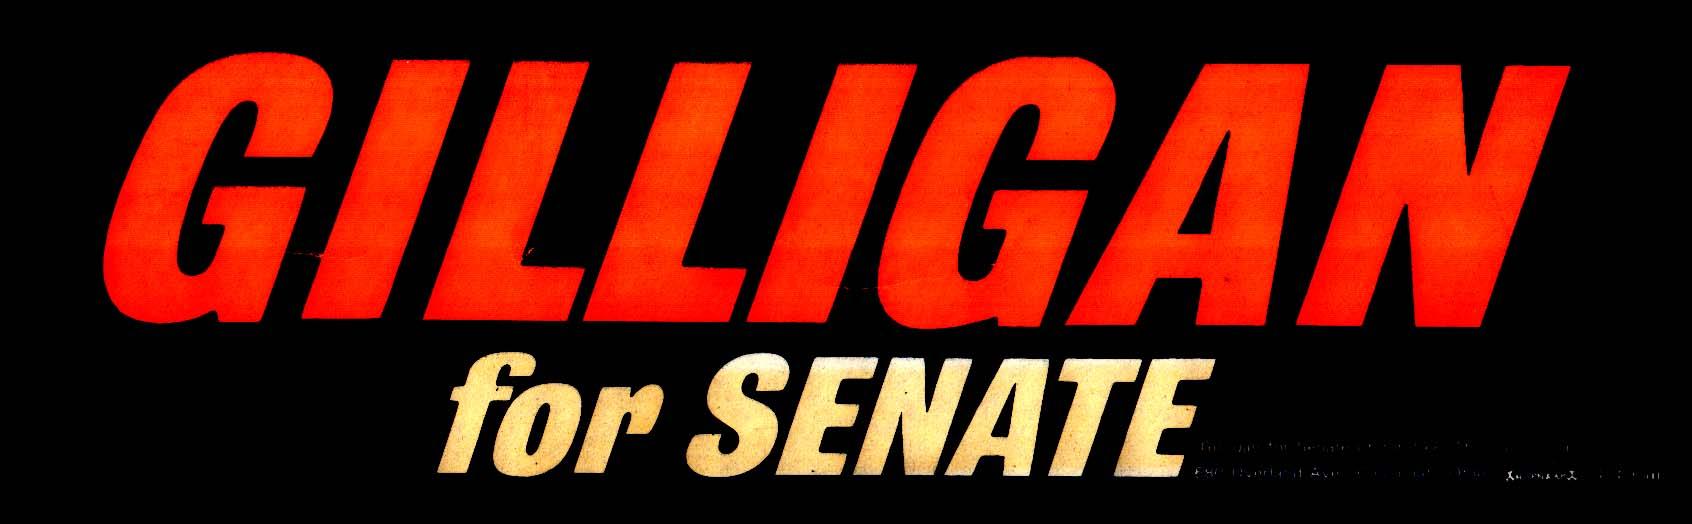 Gilligan for Senate bumpersticker Cincinnati OH 1968